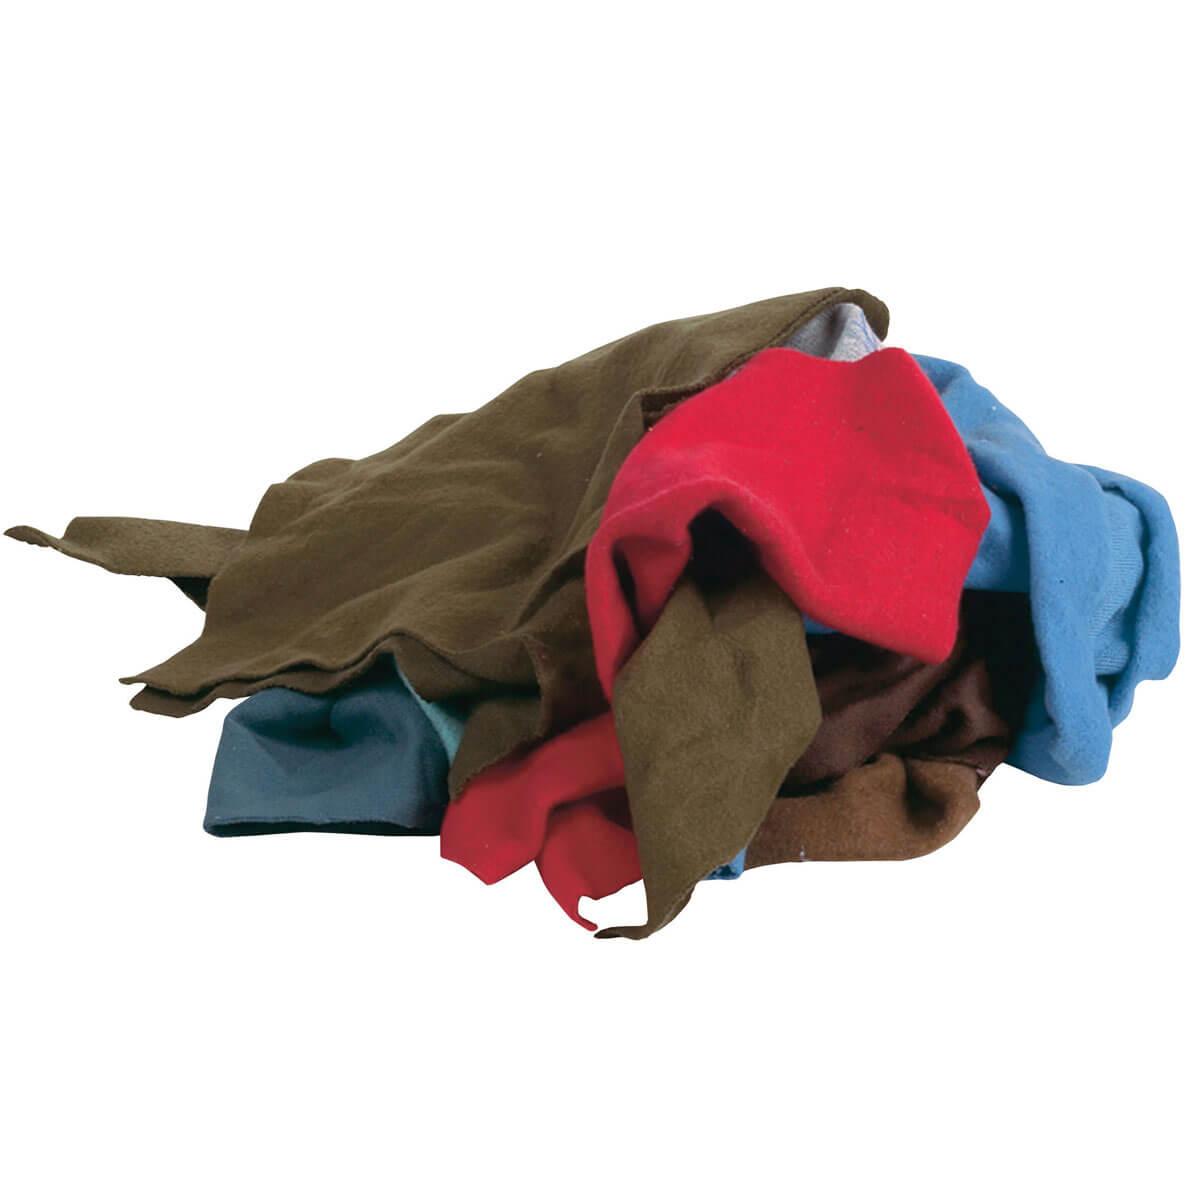 Carrand Bag of Rags